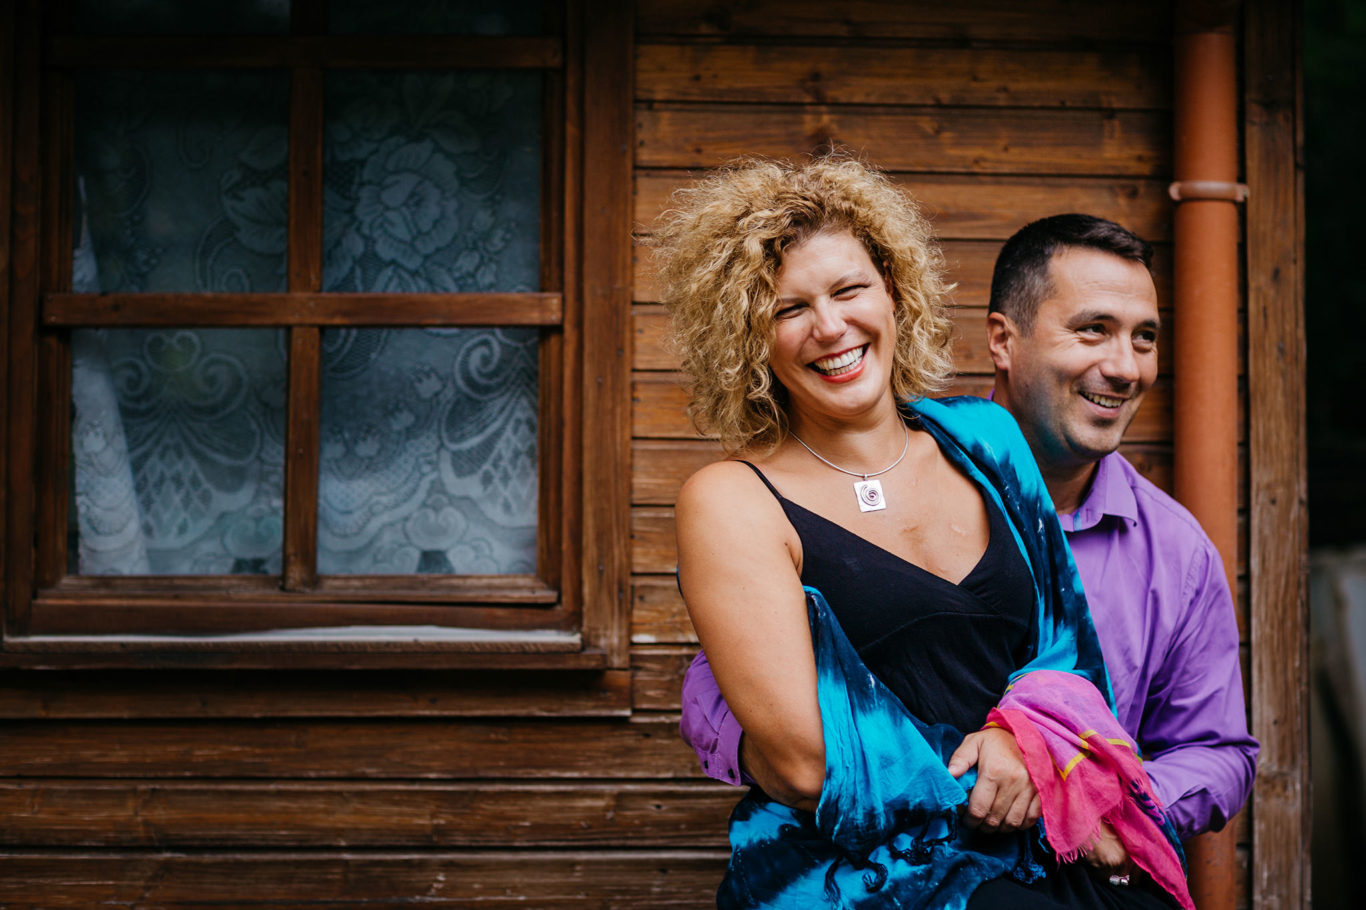 0101-fotografii-familie-ioana-alex-maia-roxi-fotograf-ciprian-dumitrescu-cd2_1891